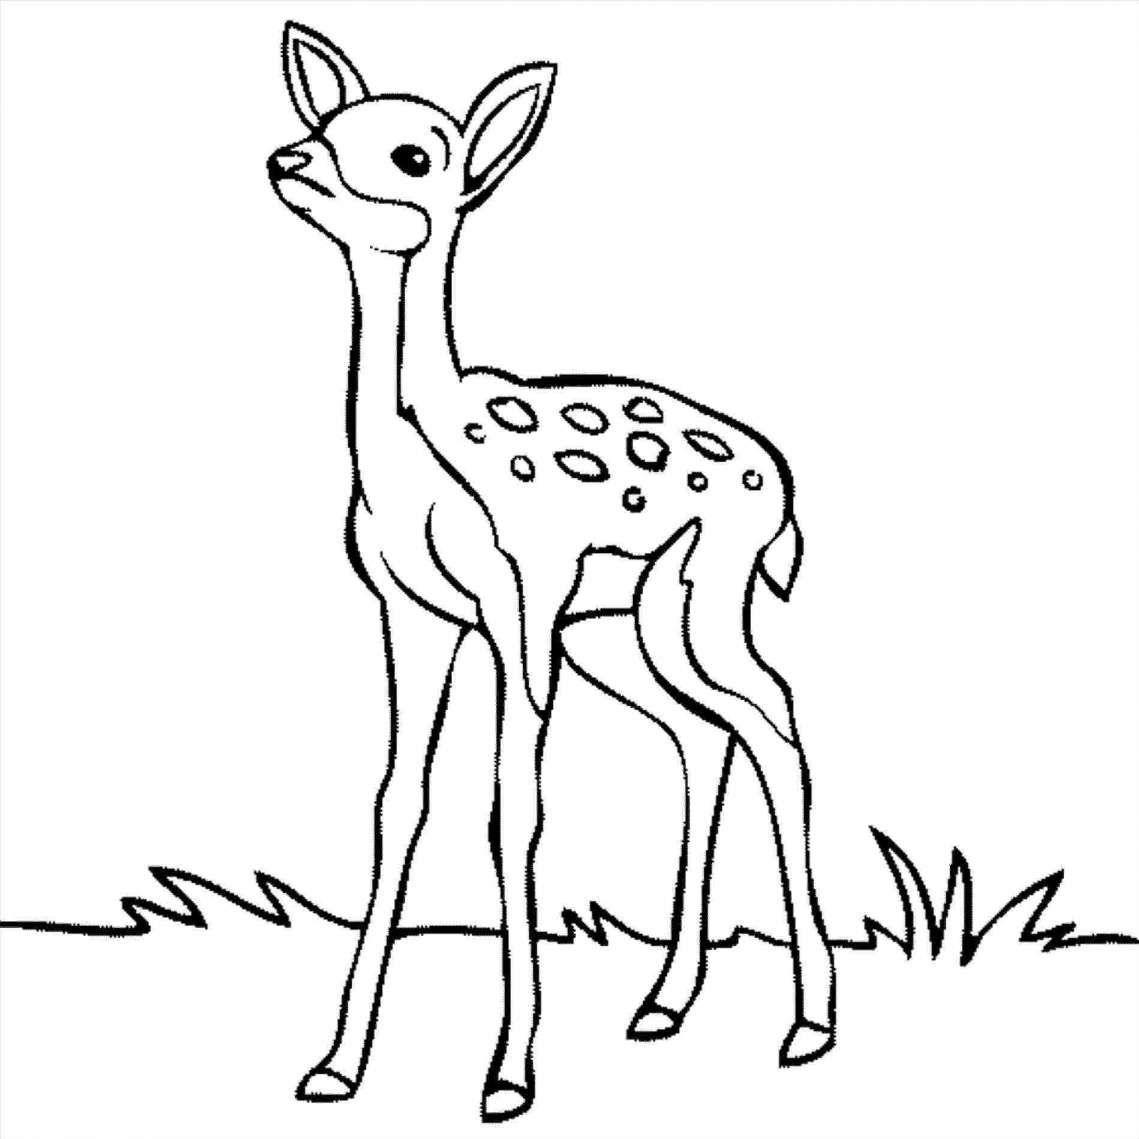 12 Baby Deer Cartoon Drawing Cartoon Drawing Drawingpencilwiki Com Animal Coloring Pages Deer Coloring Pages Animal Coloring Books